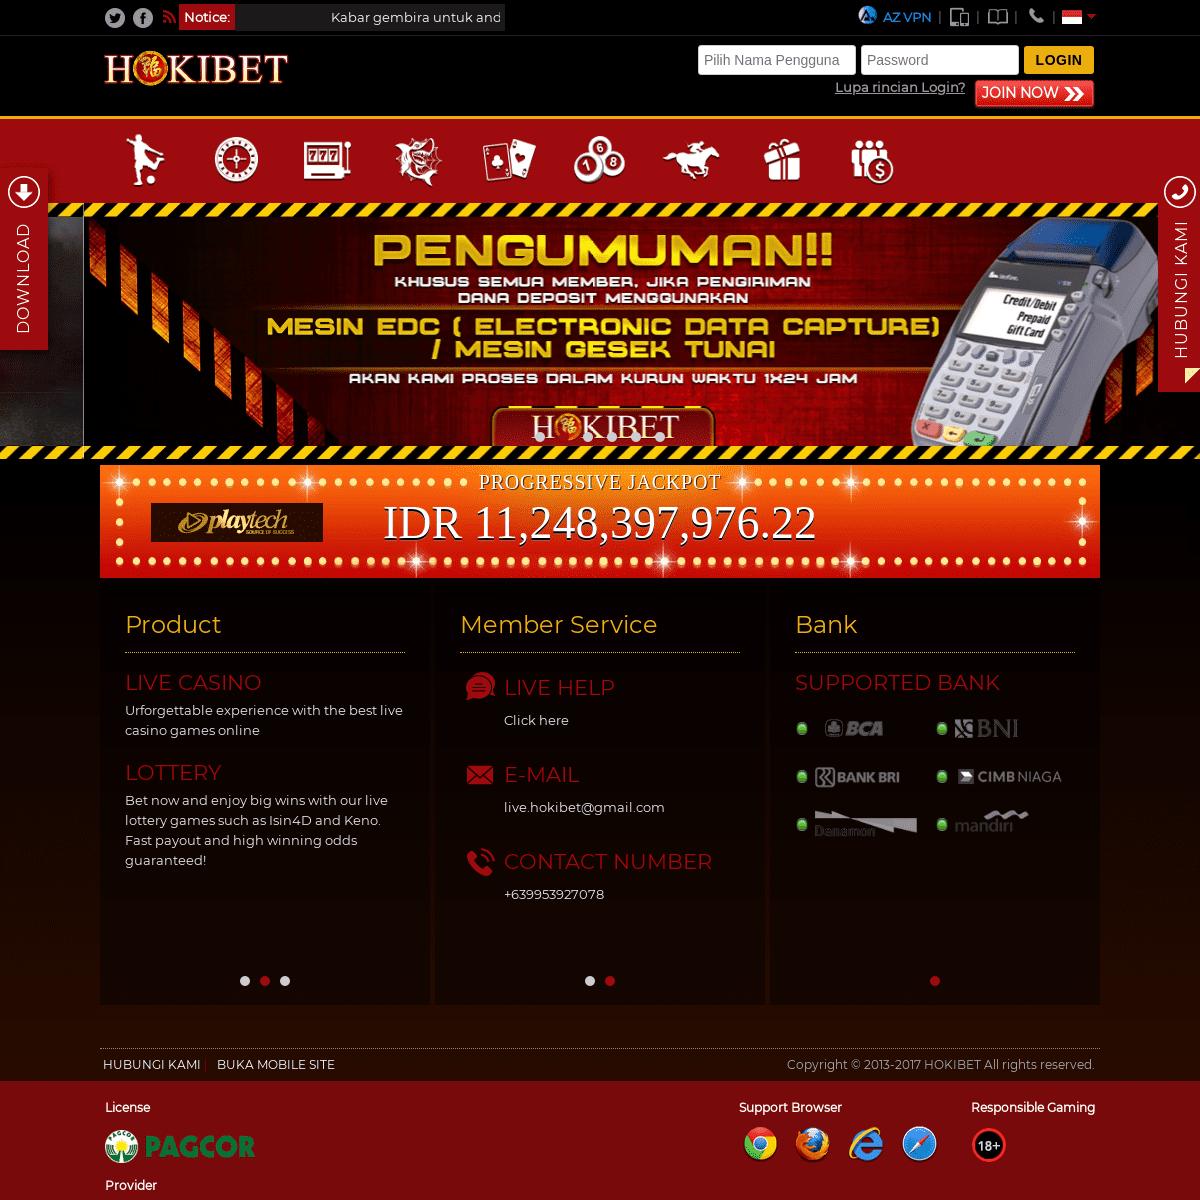 Hokibet Situs Judi Online Agen Bola Daftar Sbobet Judi Poker Online